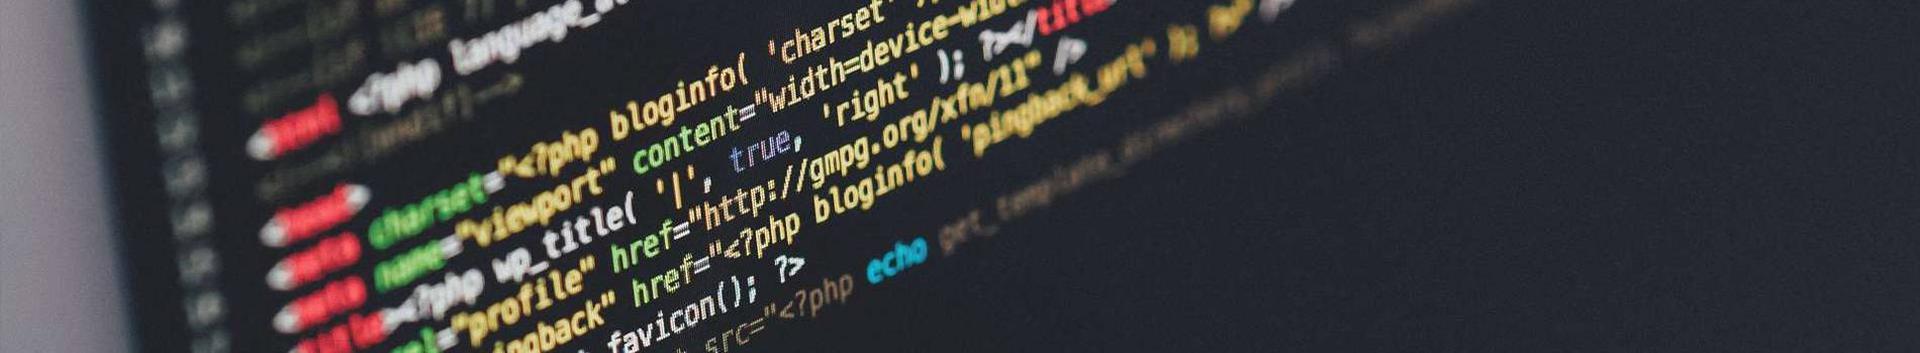 62011_programmeerimine_86722191_xl.jpg